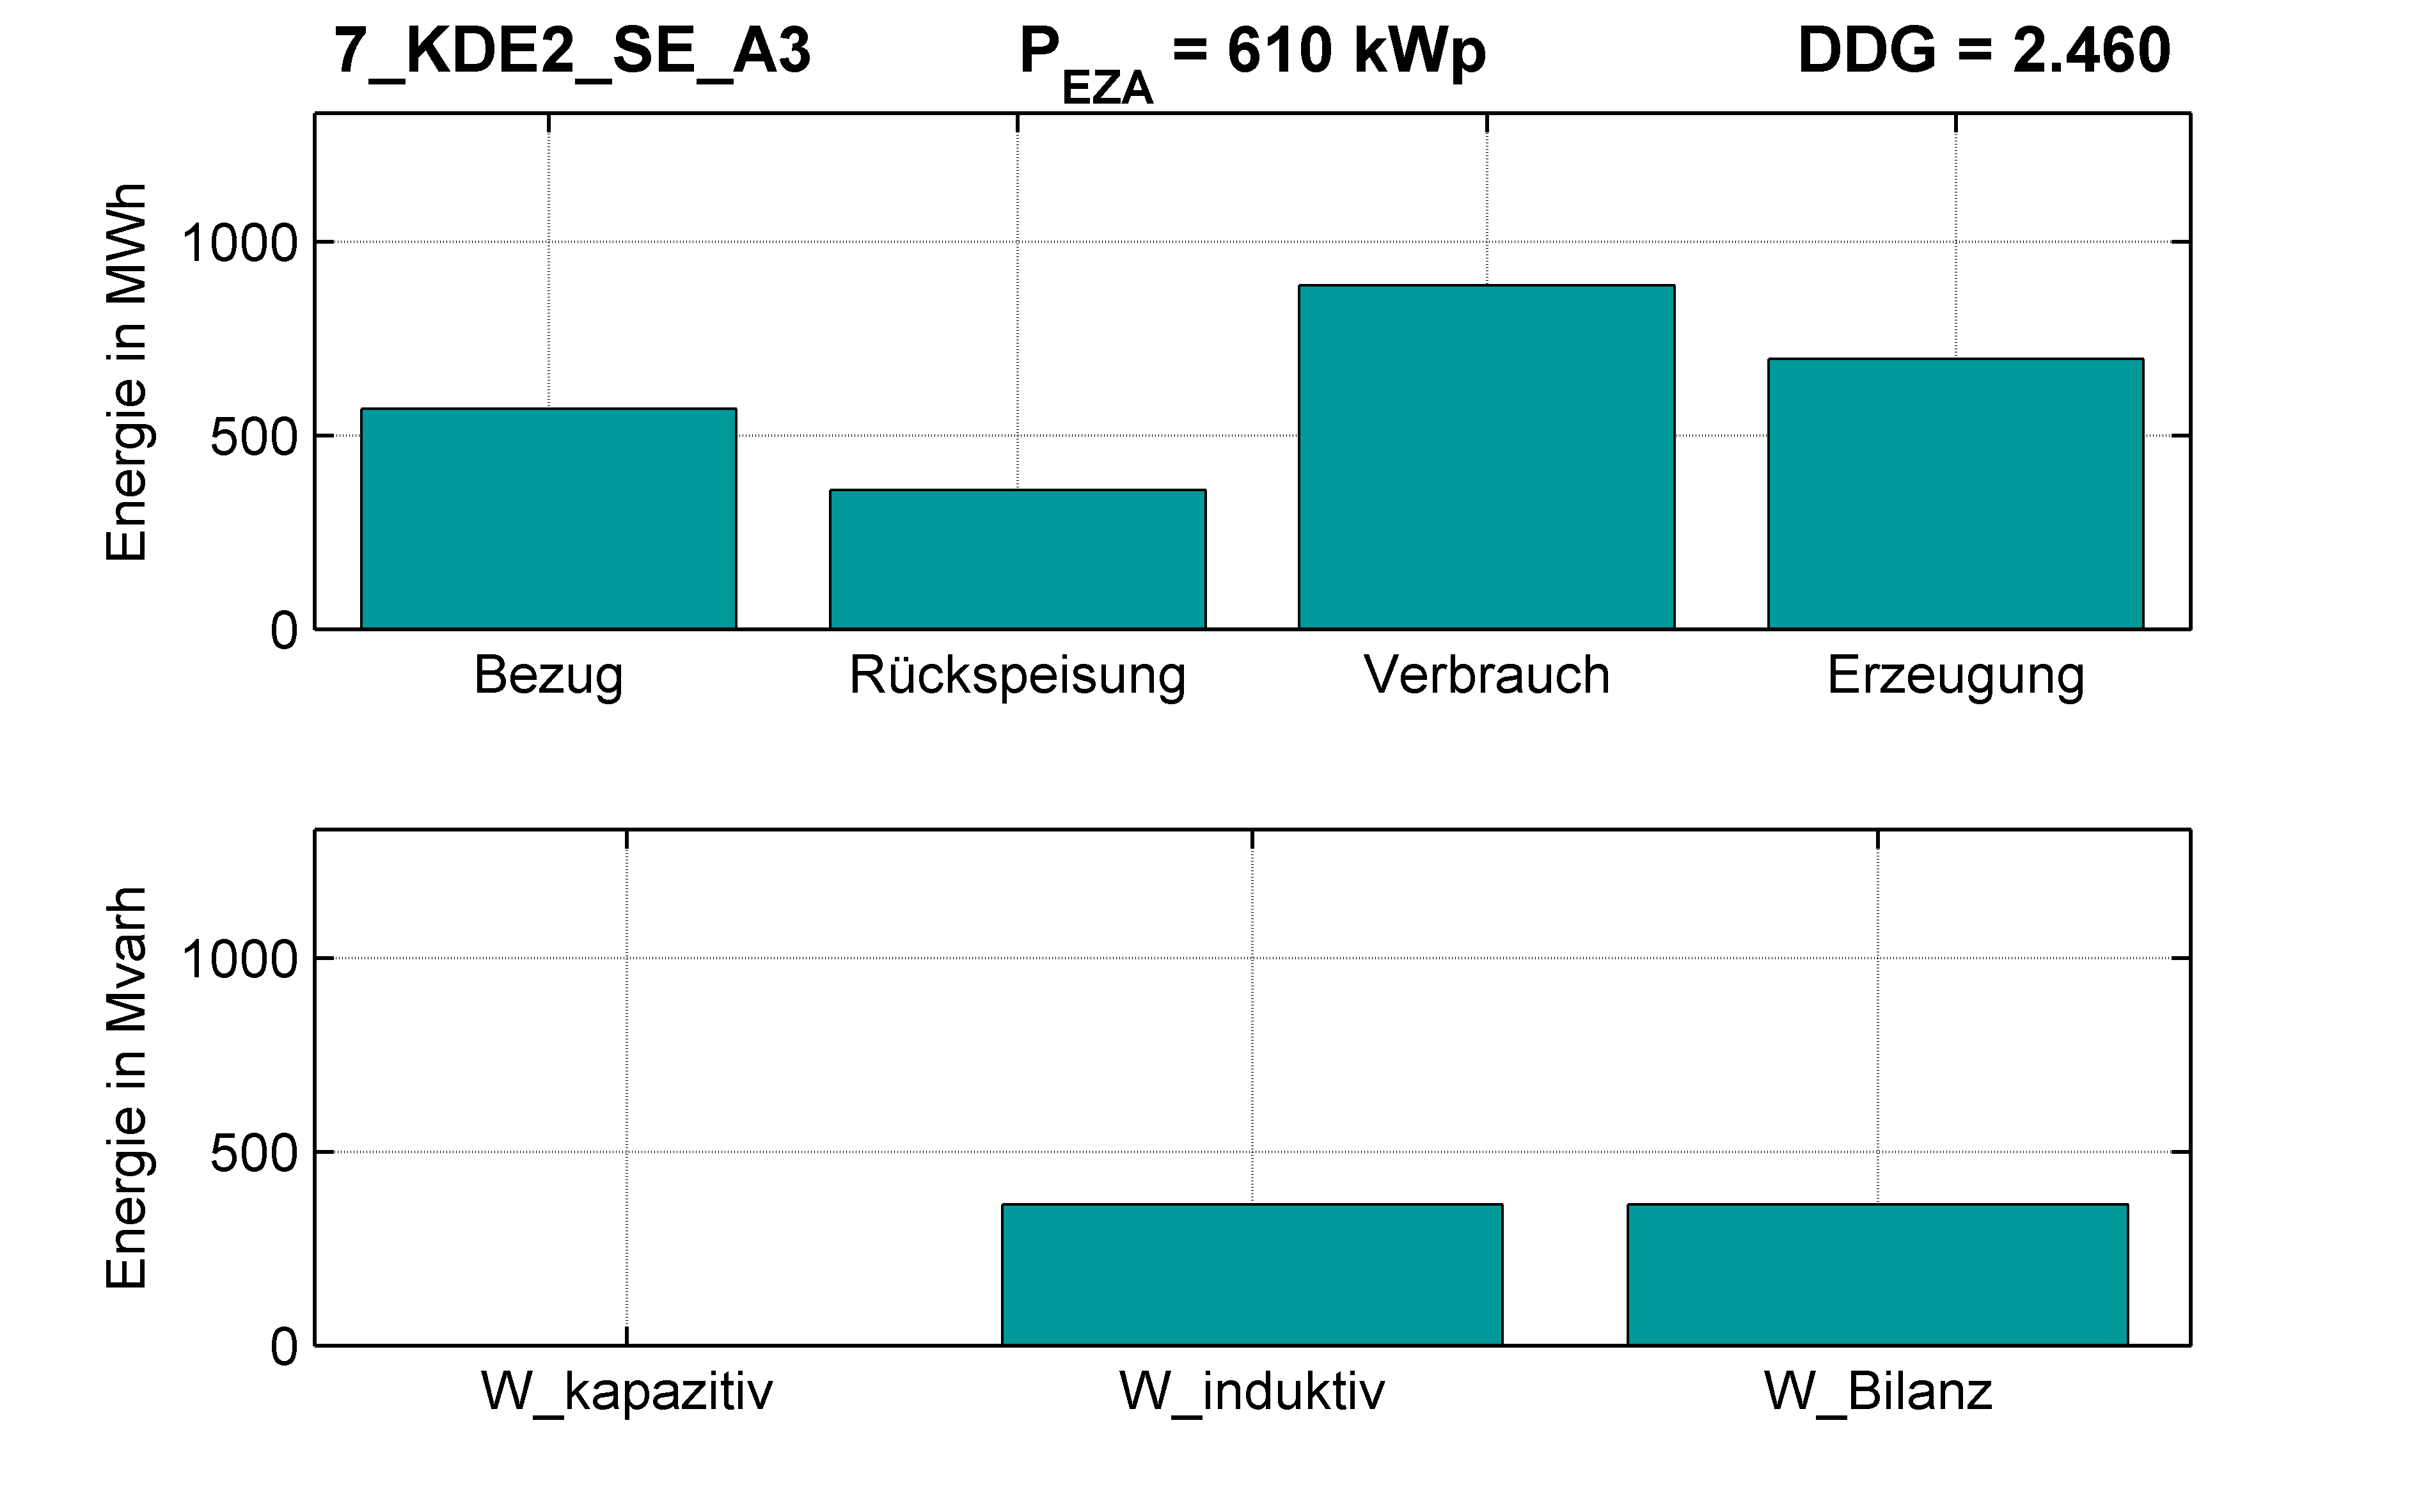 KDE2 | Längsregler (SE) A3 | PQ-Bilanz